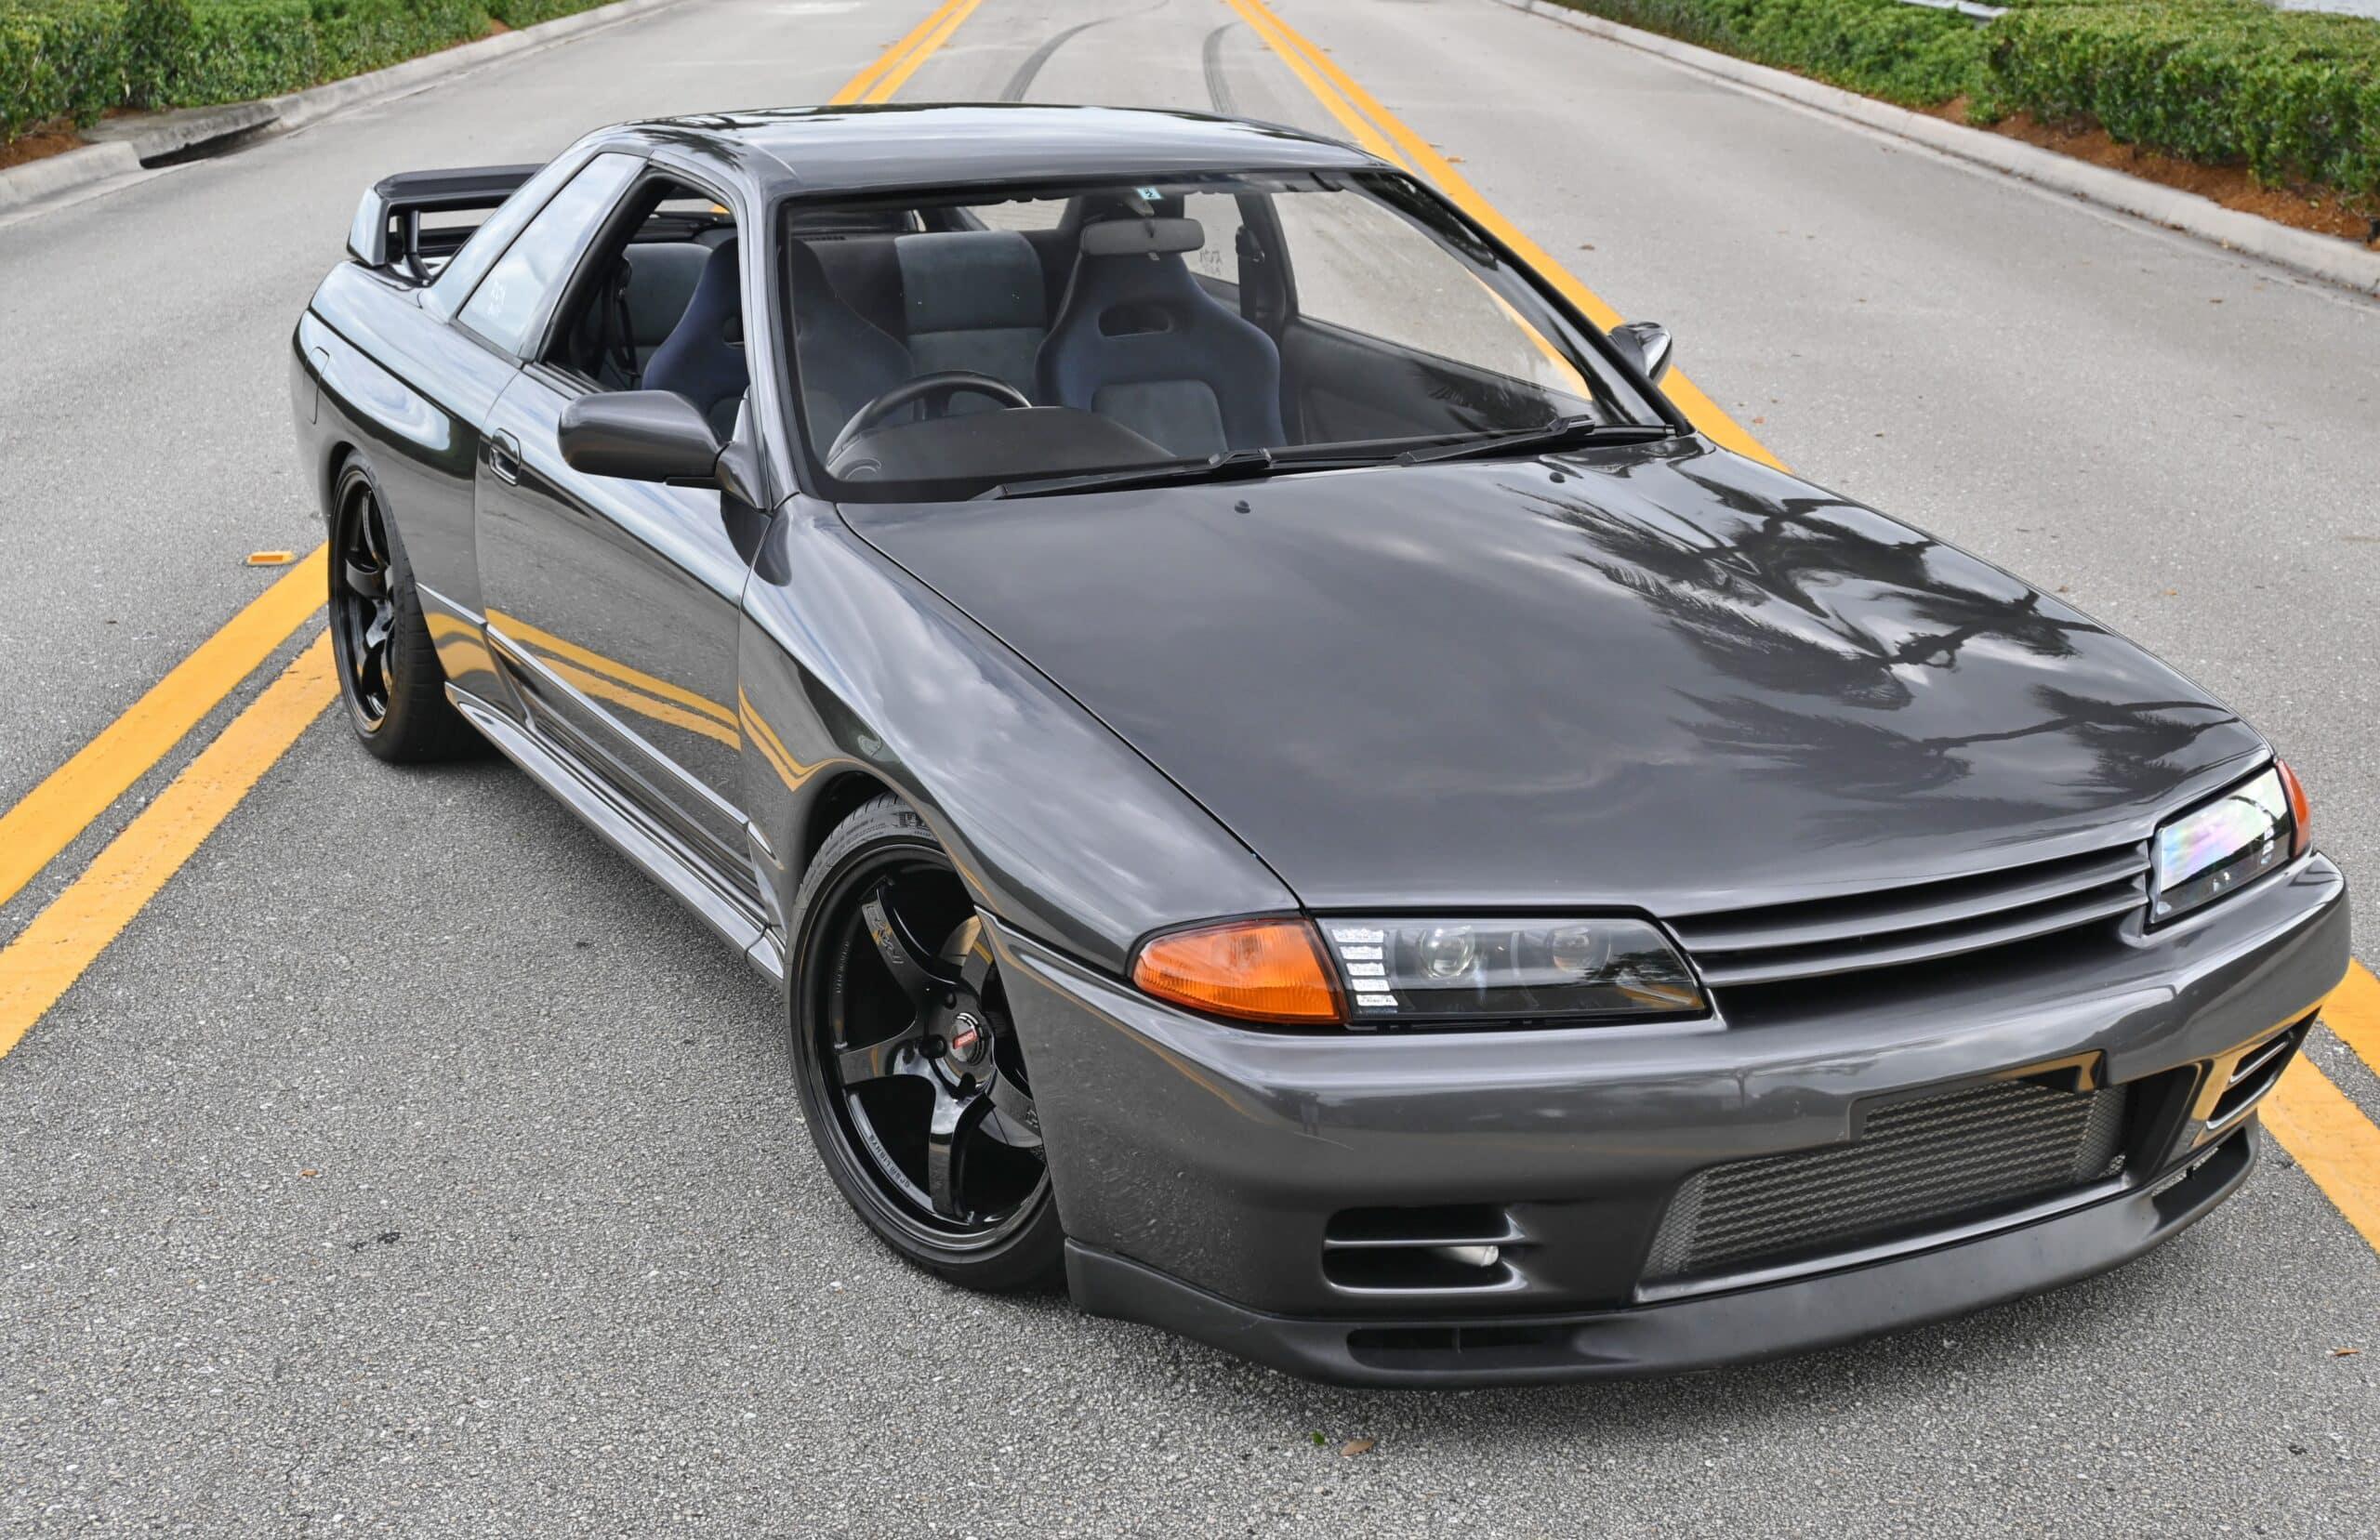 1991 Nissan GT-R R32 Skyline Built RB26 Single Turbo 600HP – Fully Sorted – Documented build – Turn Key R32